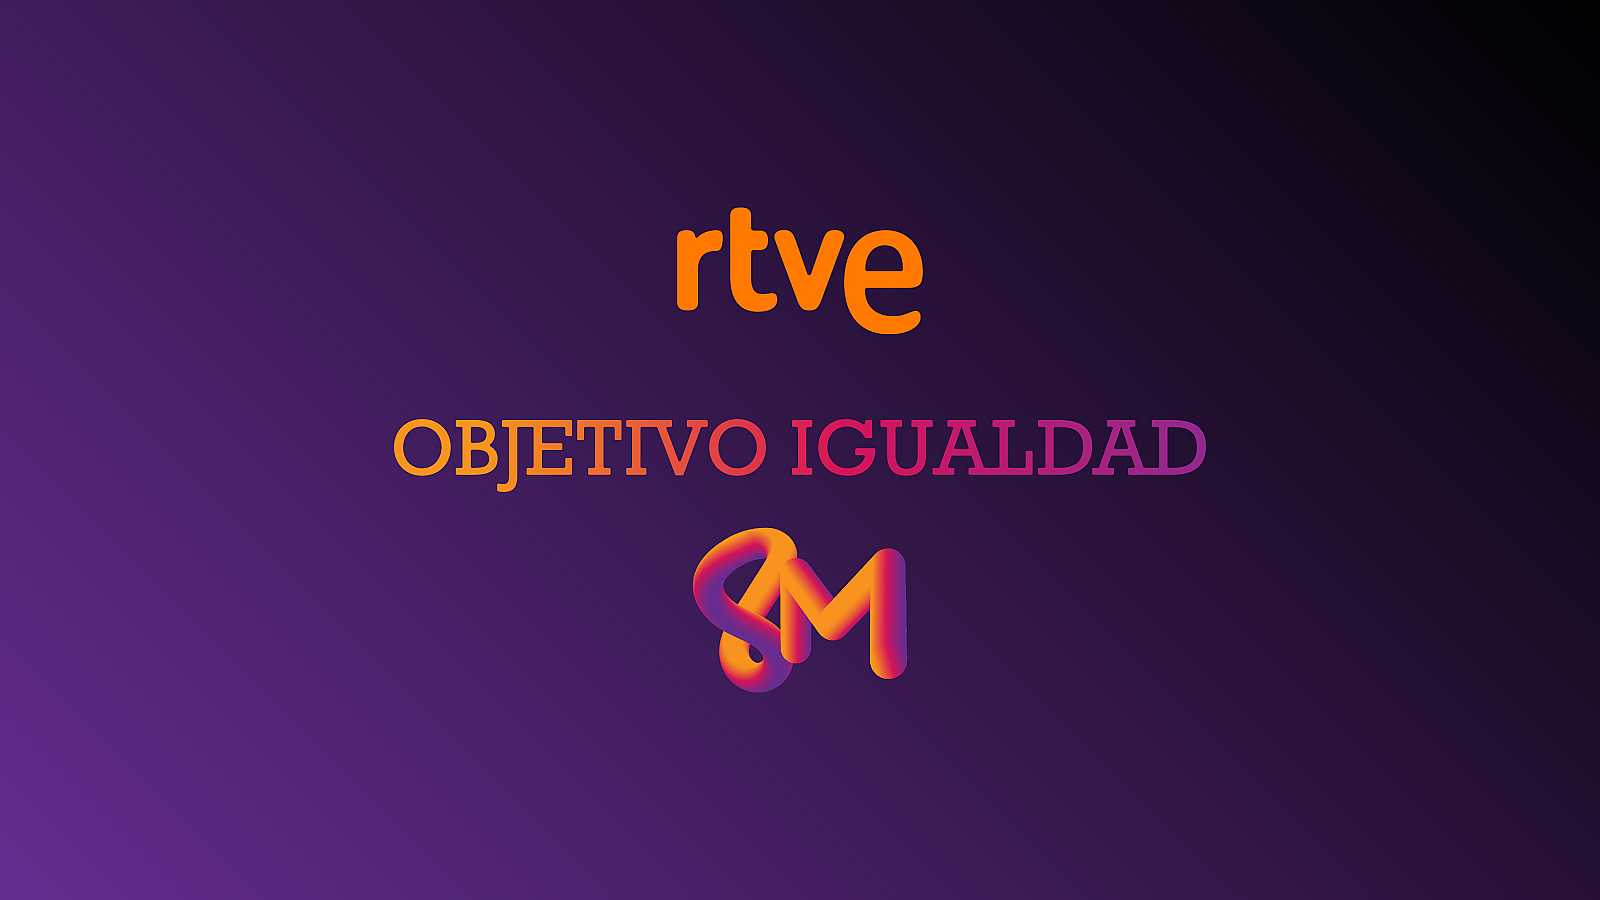 Objetivo Igualdad en RTVE